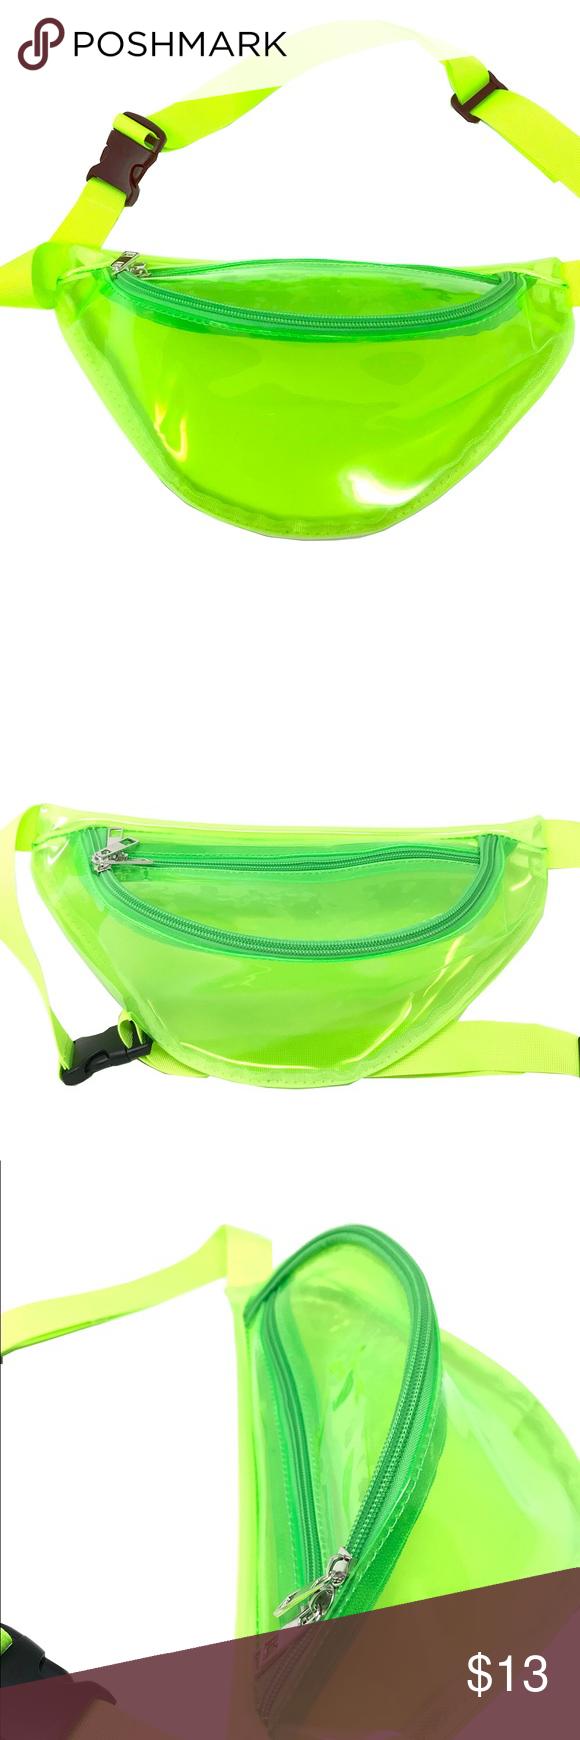 a4288401c685 Clear Green Fanny Pack Polyurethane Mini Bag Clear Green Fanny Pack ...